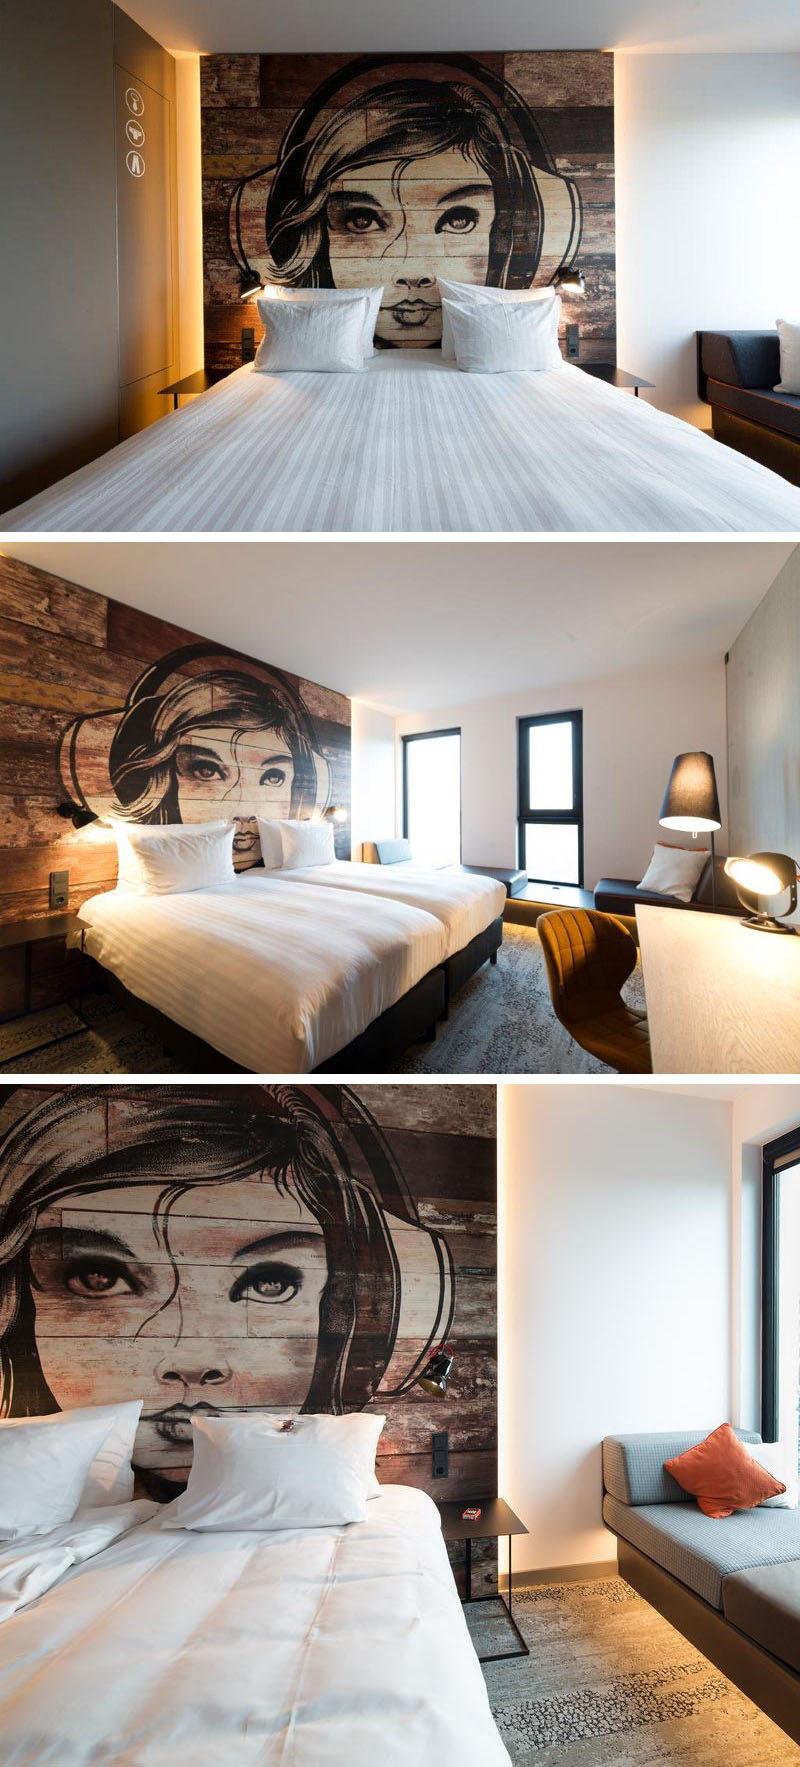 Headboard Design Idea - Mural Painted On Wood